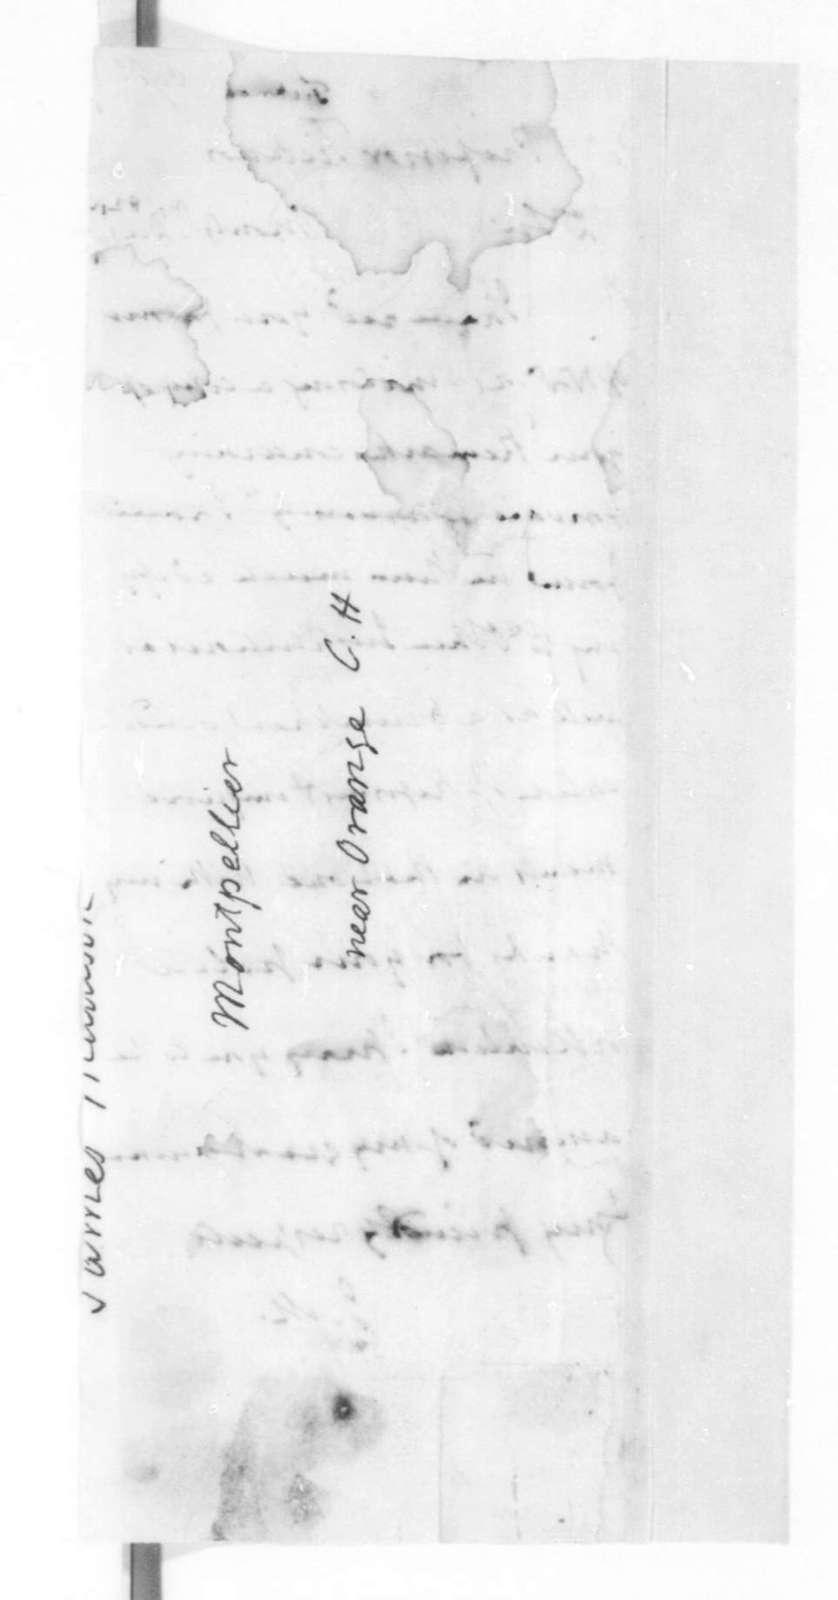 James Madison to George Ticknor, December 1, 1825.